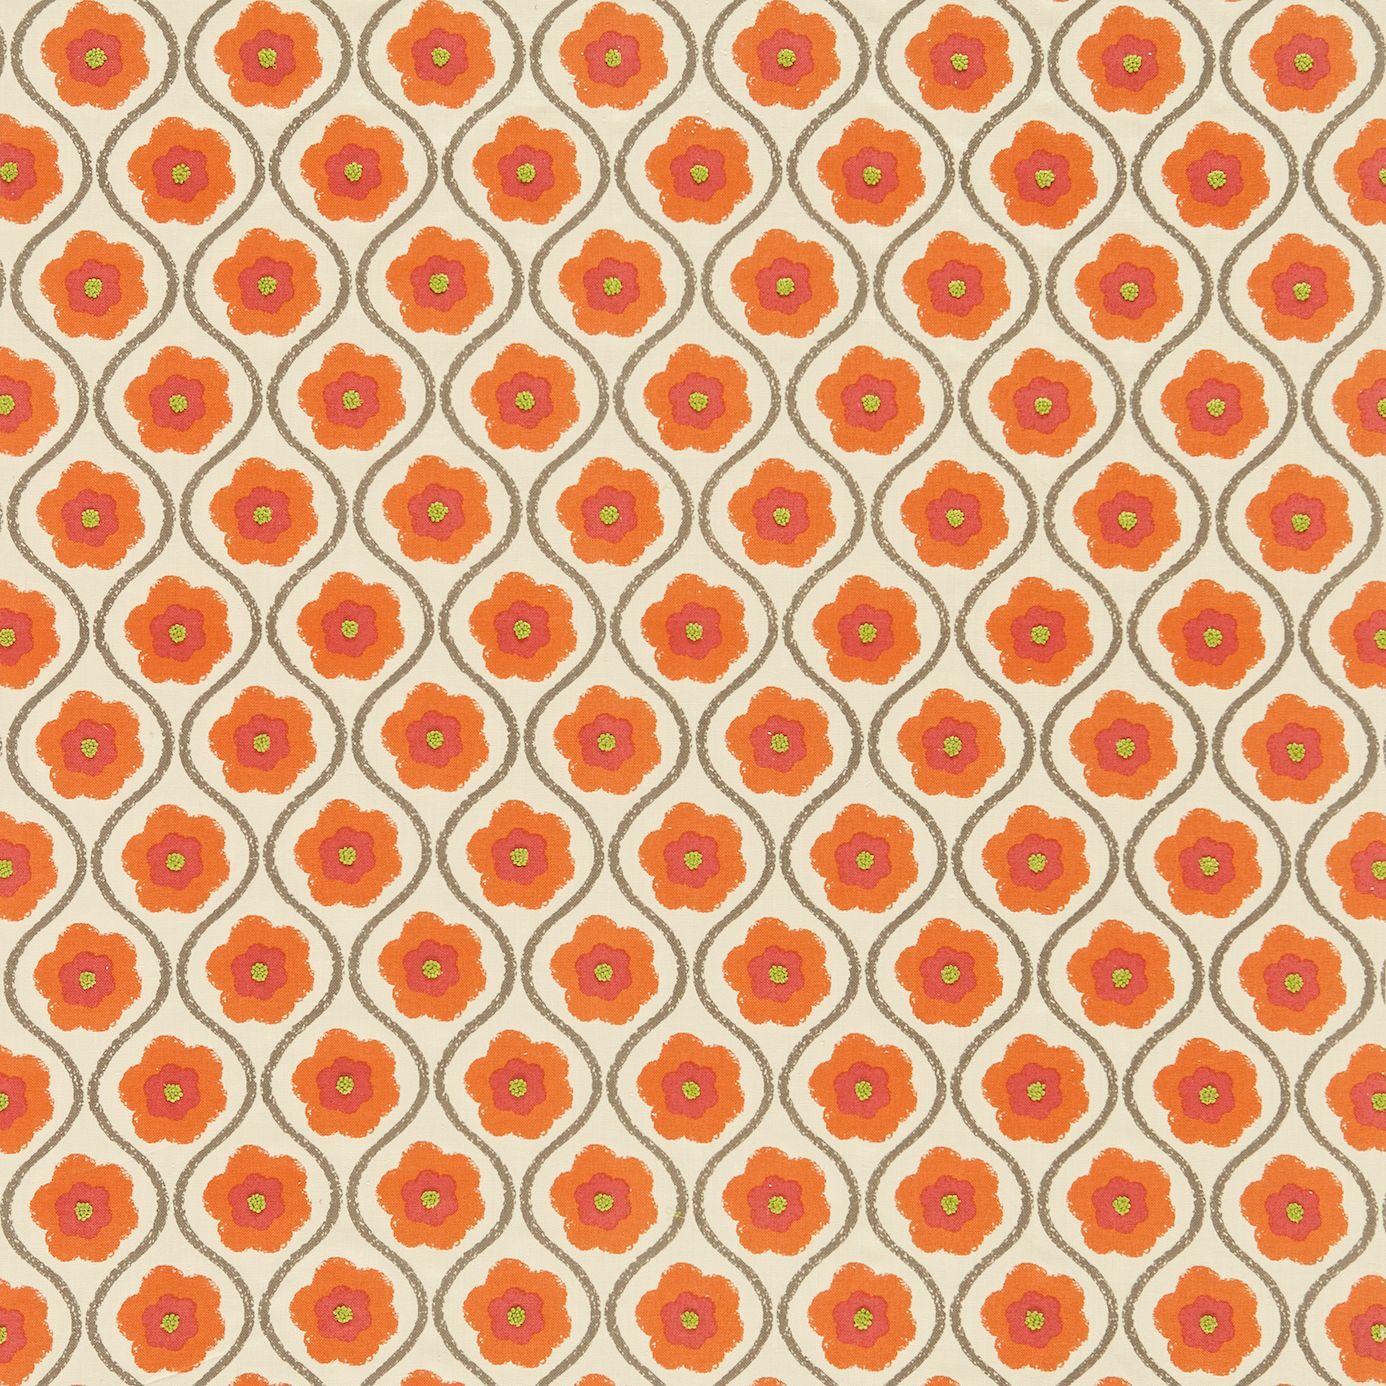 Sira Fabric Orange Zest Neutral 130336 Harlequin